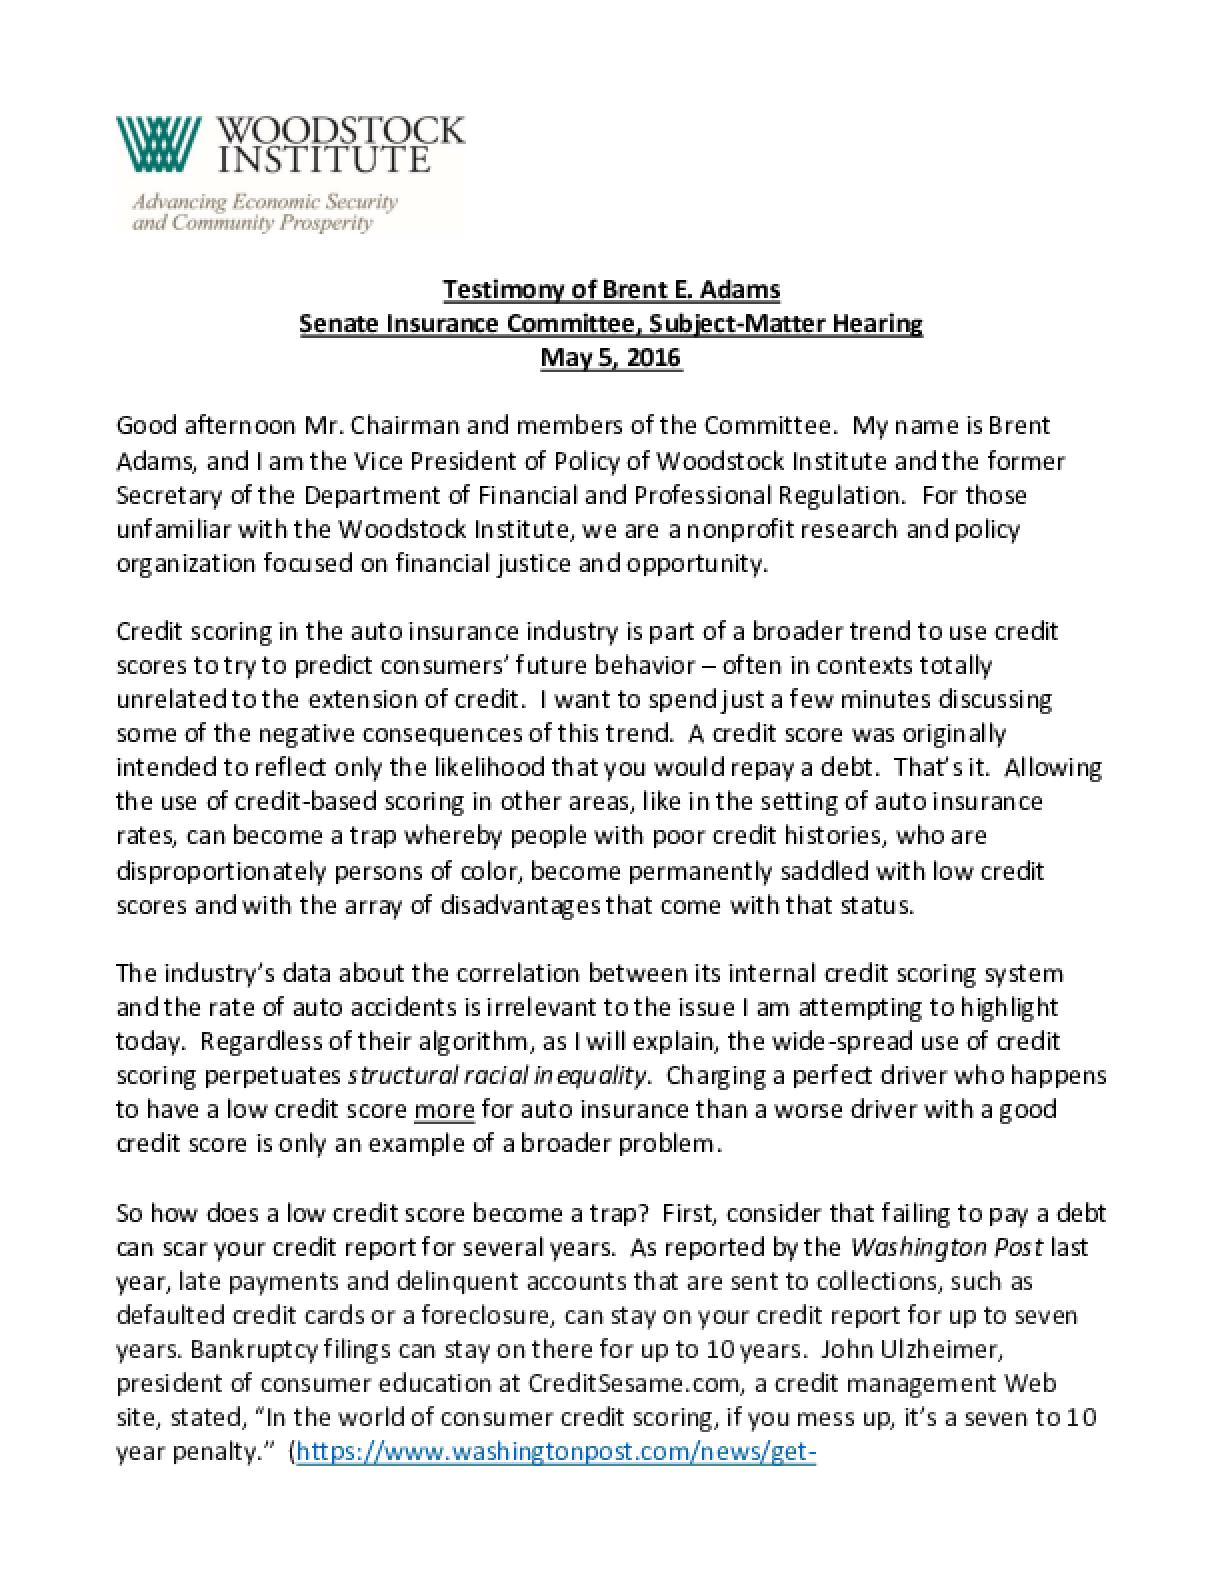 Testimony of Brent E. Adams before the Senate Insurance Committee, Subject-Matter Hearing